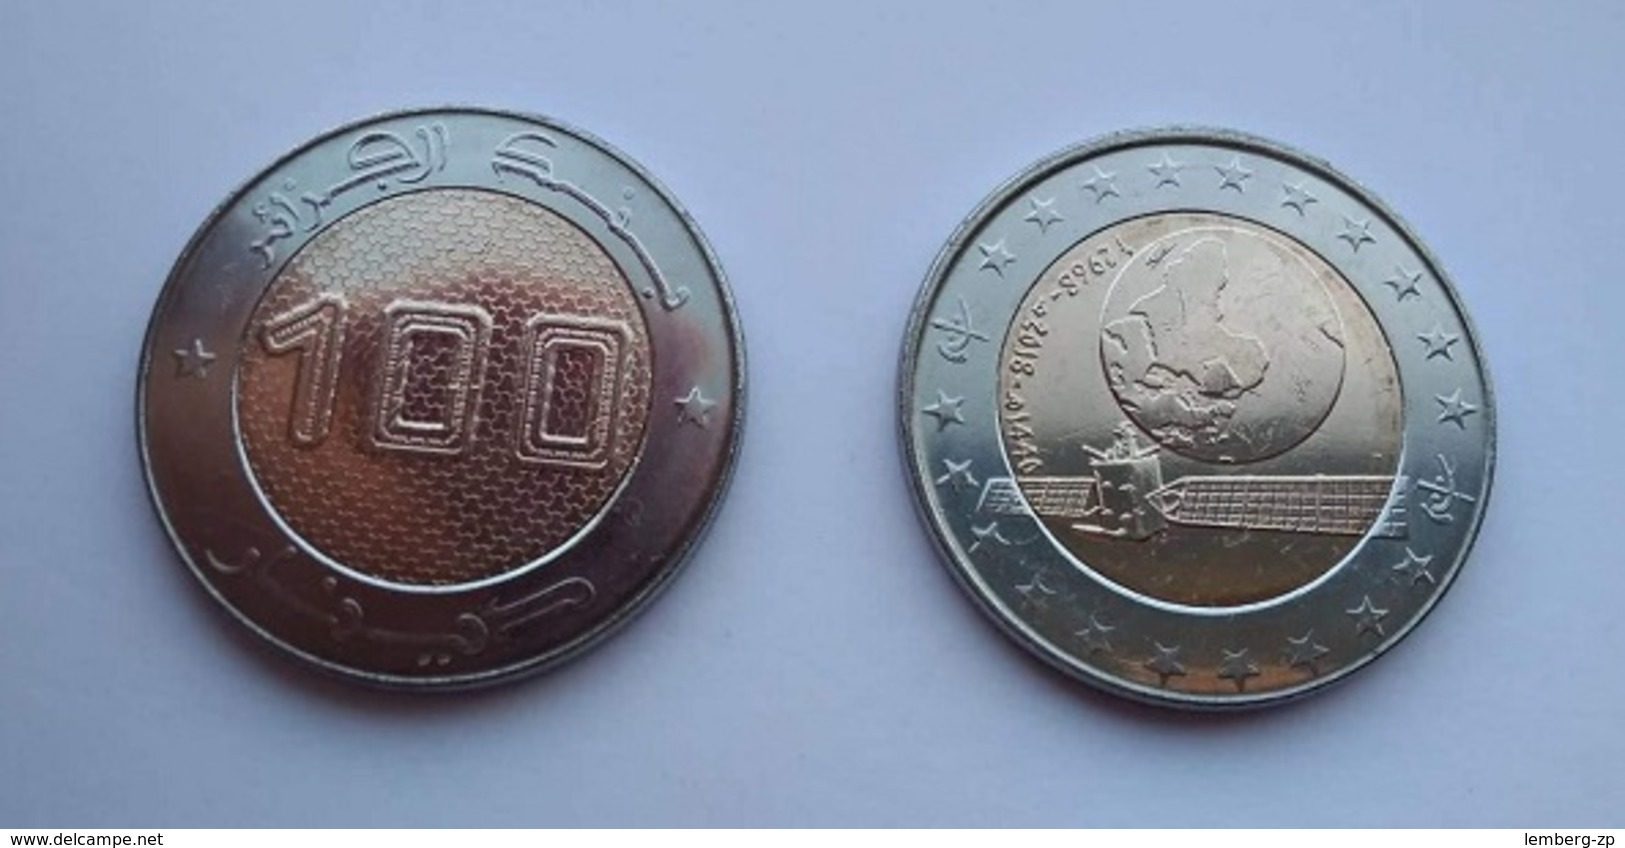 Algeria - 100 Dinars 2018 UNC Lemberg-Zp - Algérie